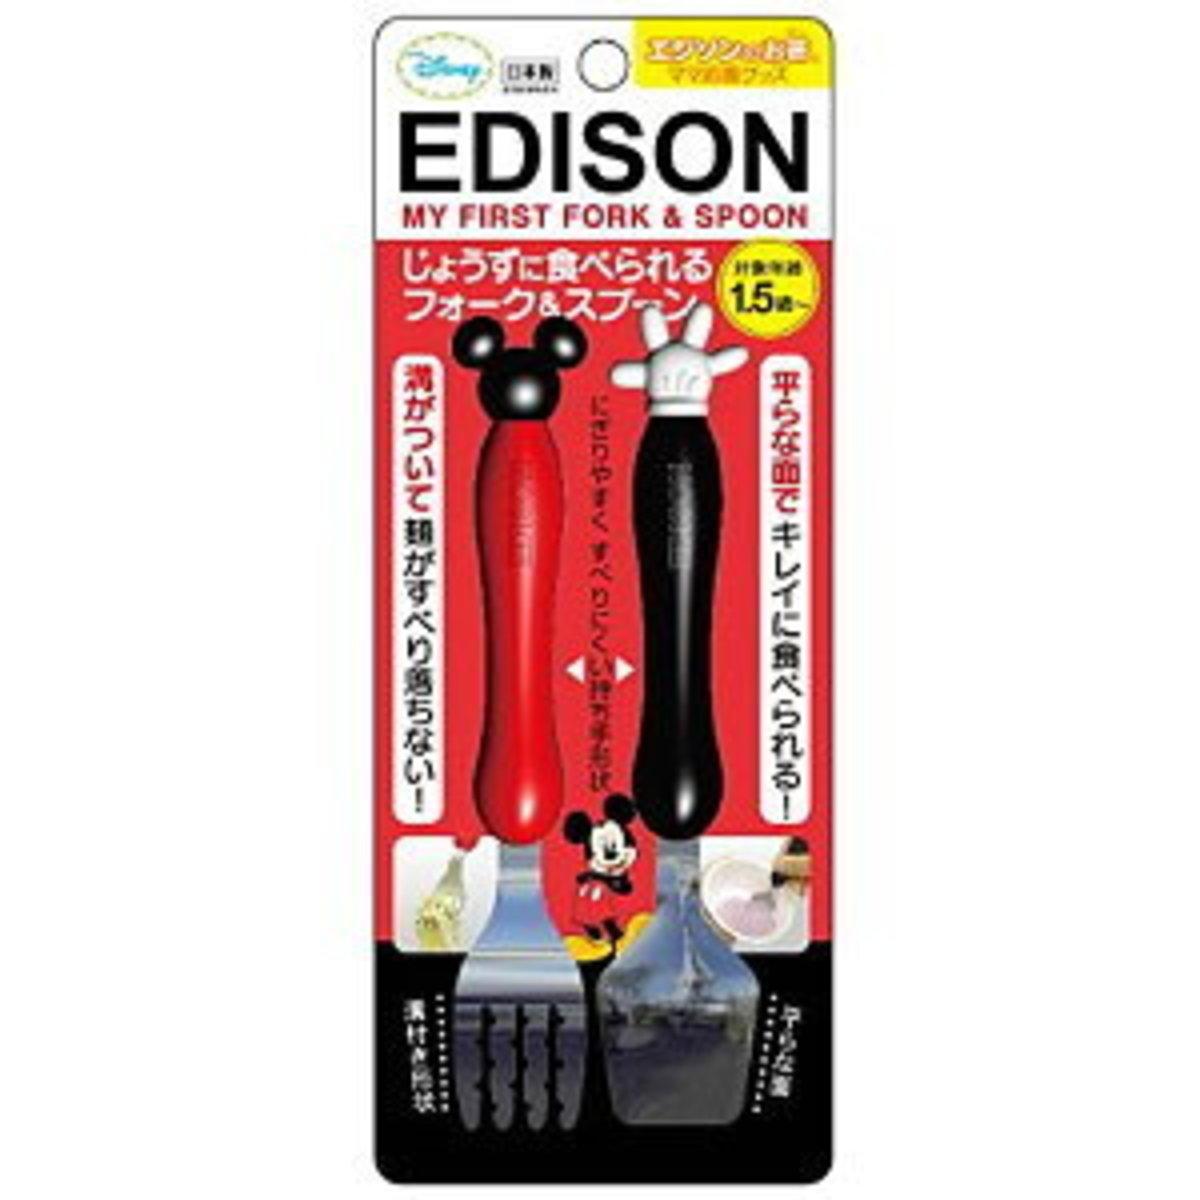 Edison 1.5歲起嬰兒手感餐具套庄(匙+叉)米奇